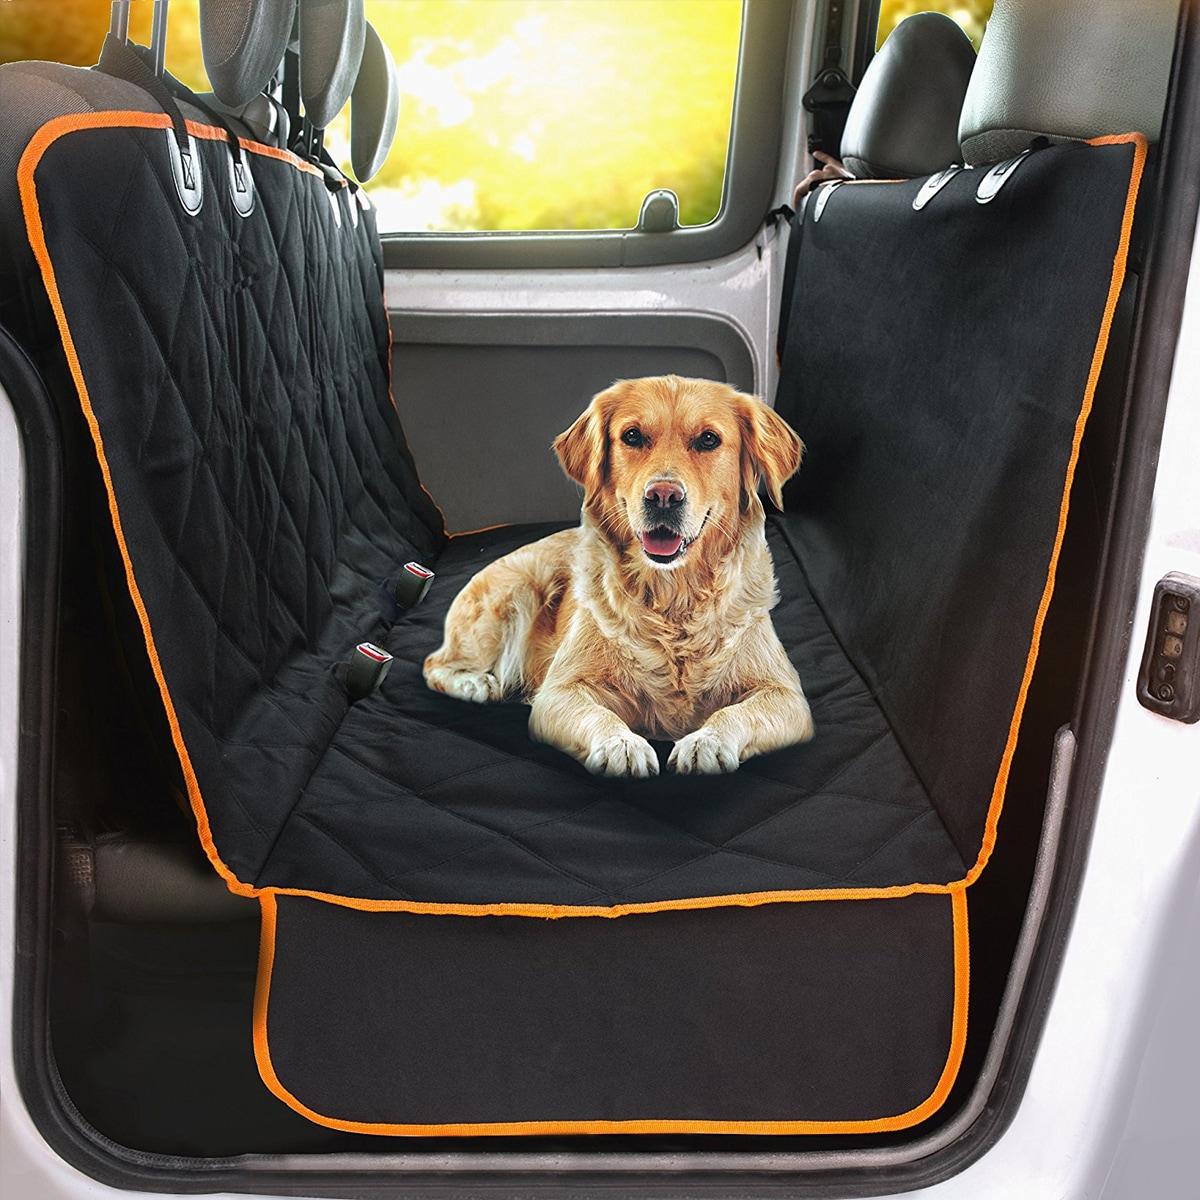 Gesteppter Autositzbezug für Hunde